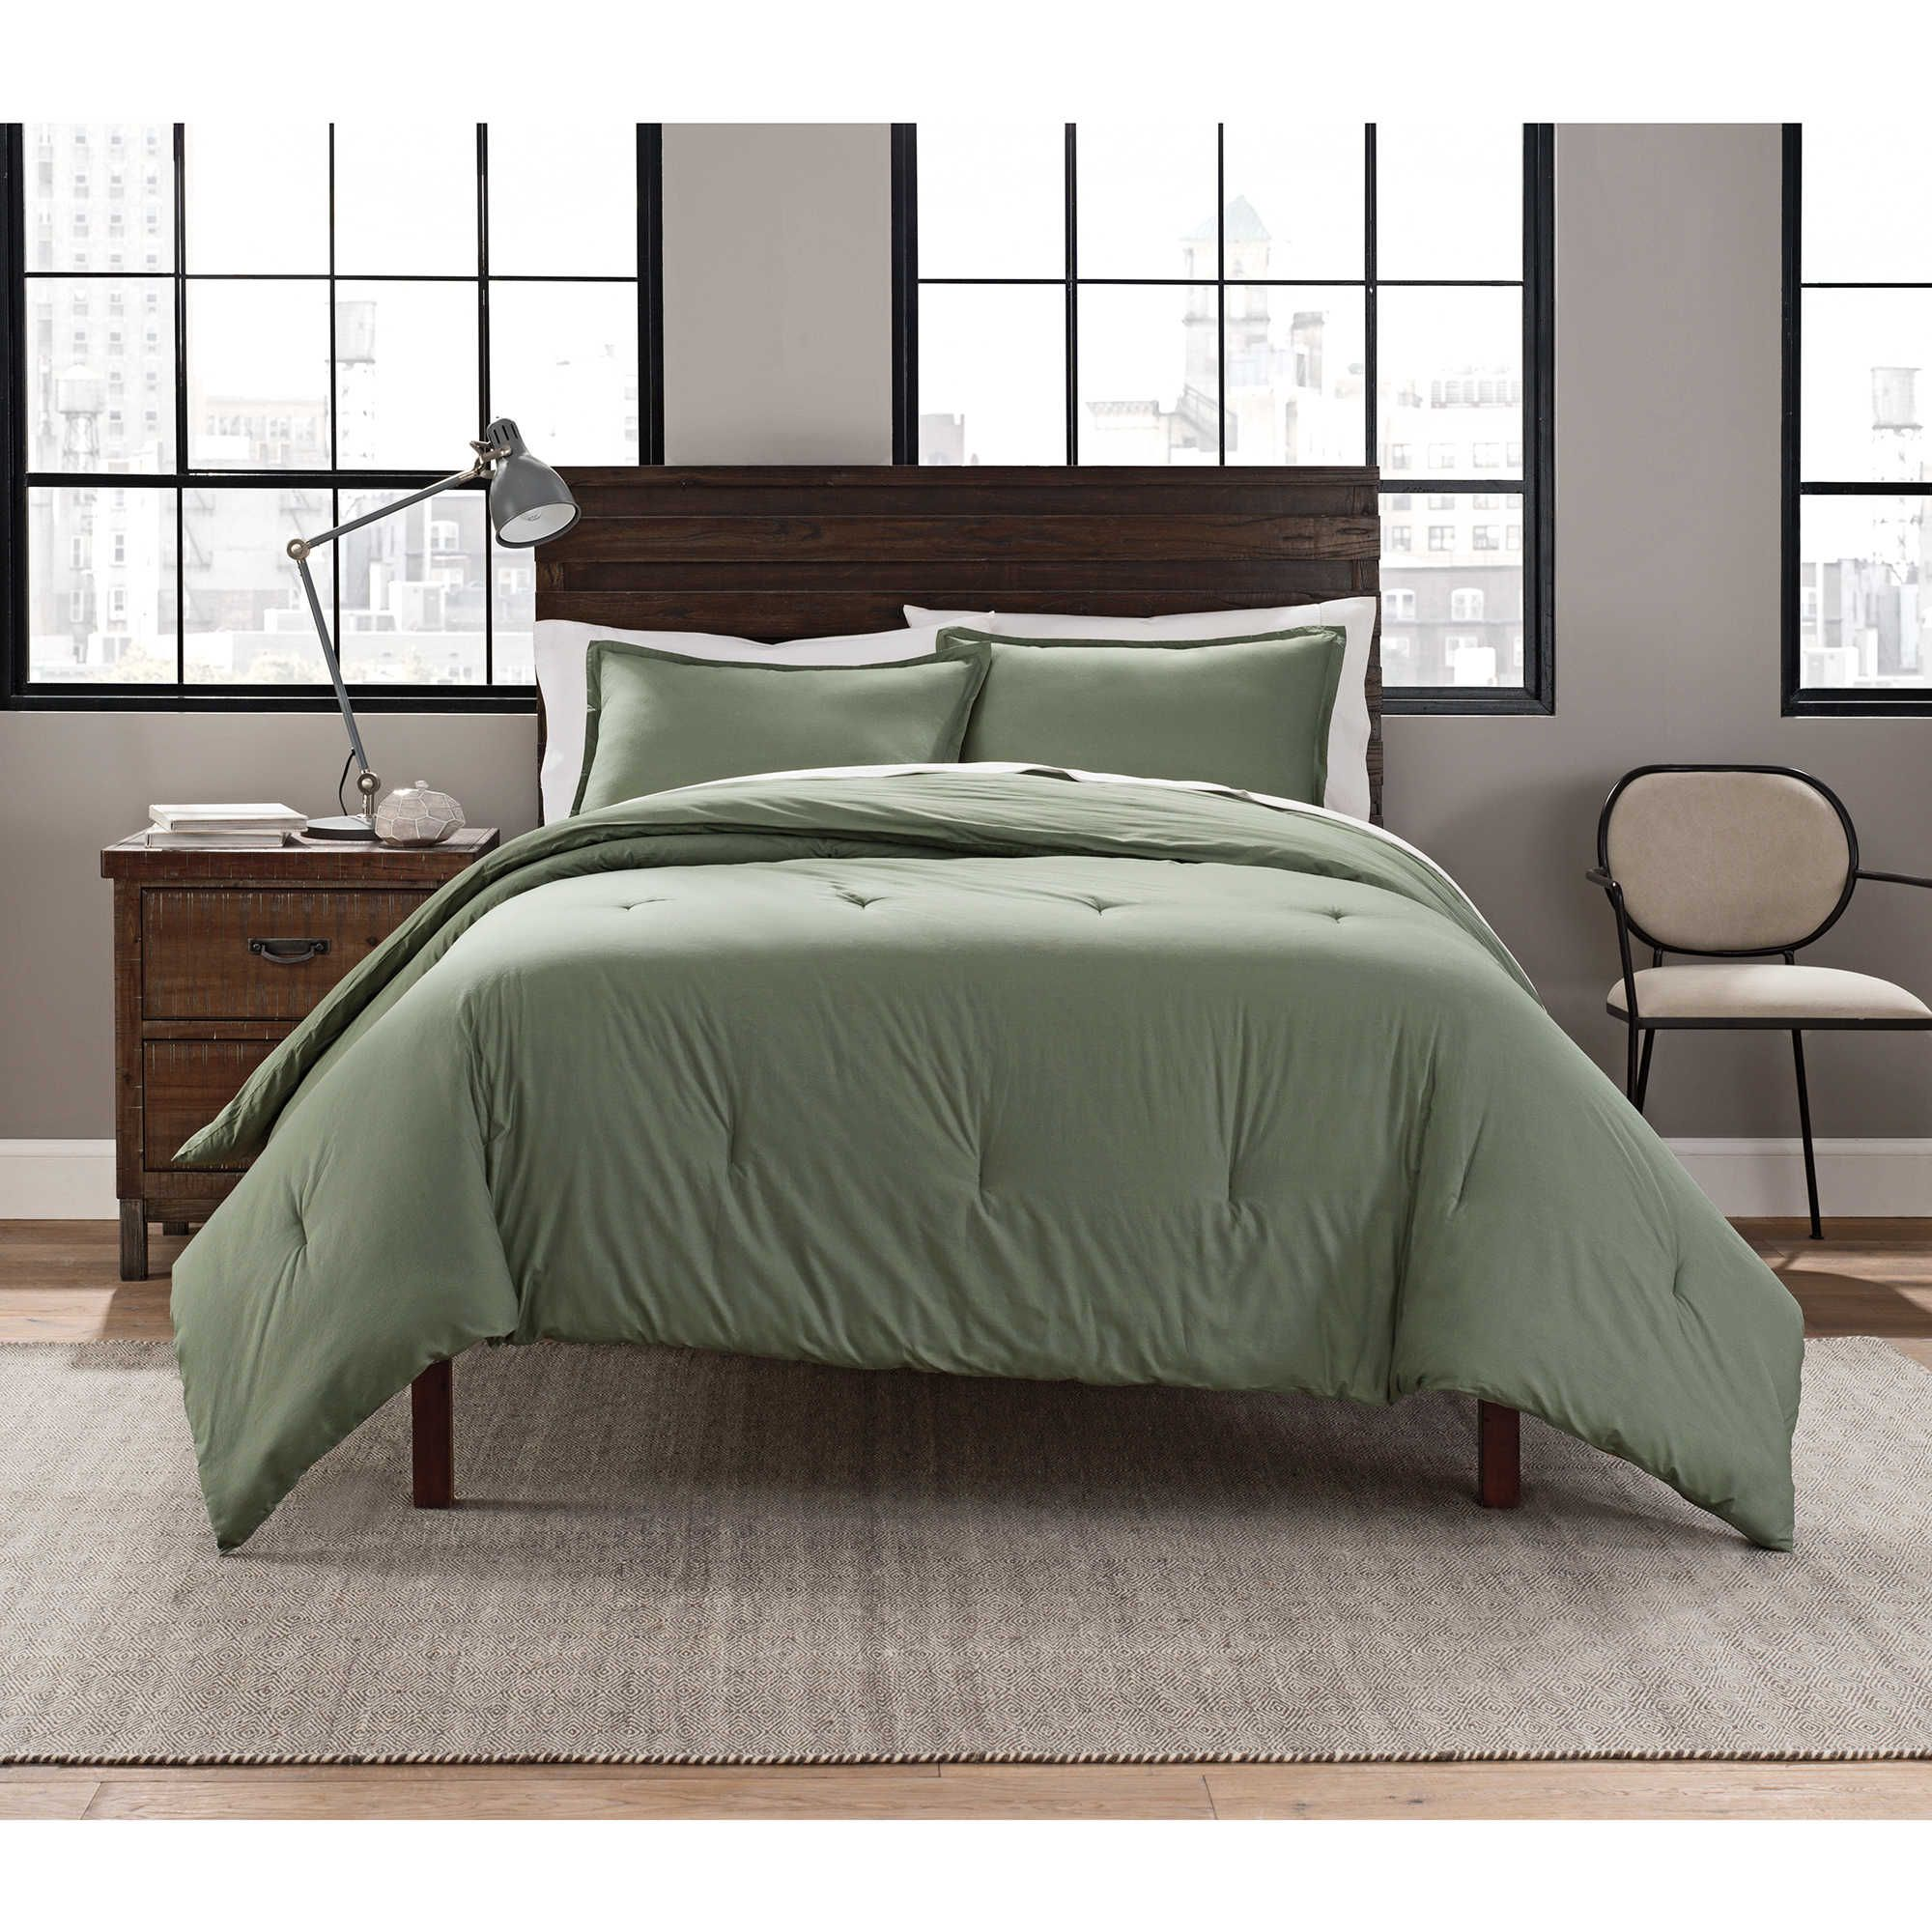 Garment Washed Solid Comforter Set Queen comforter sets